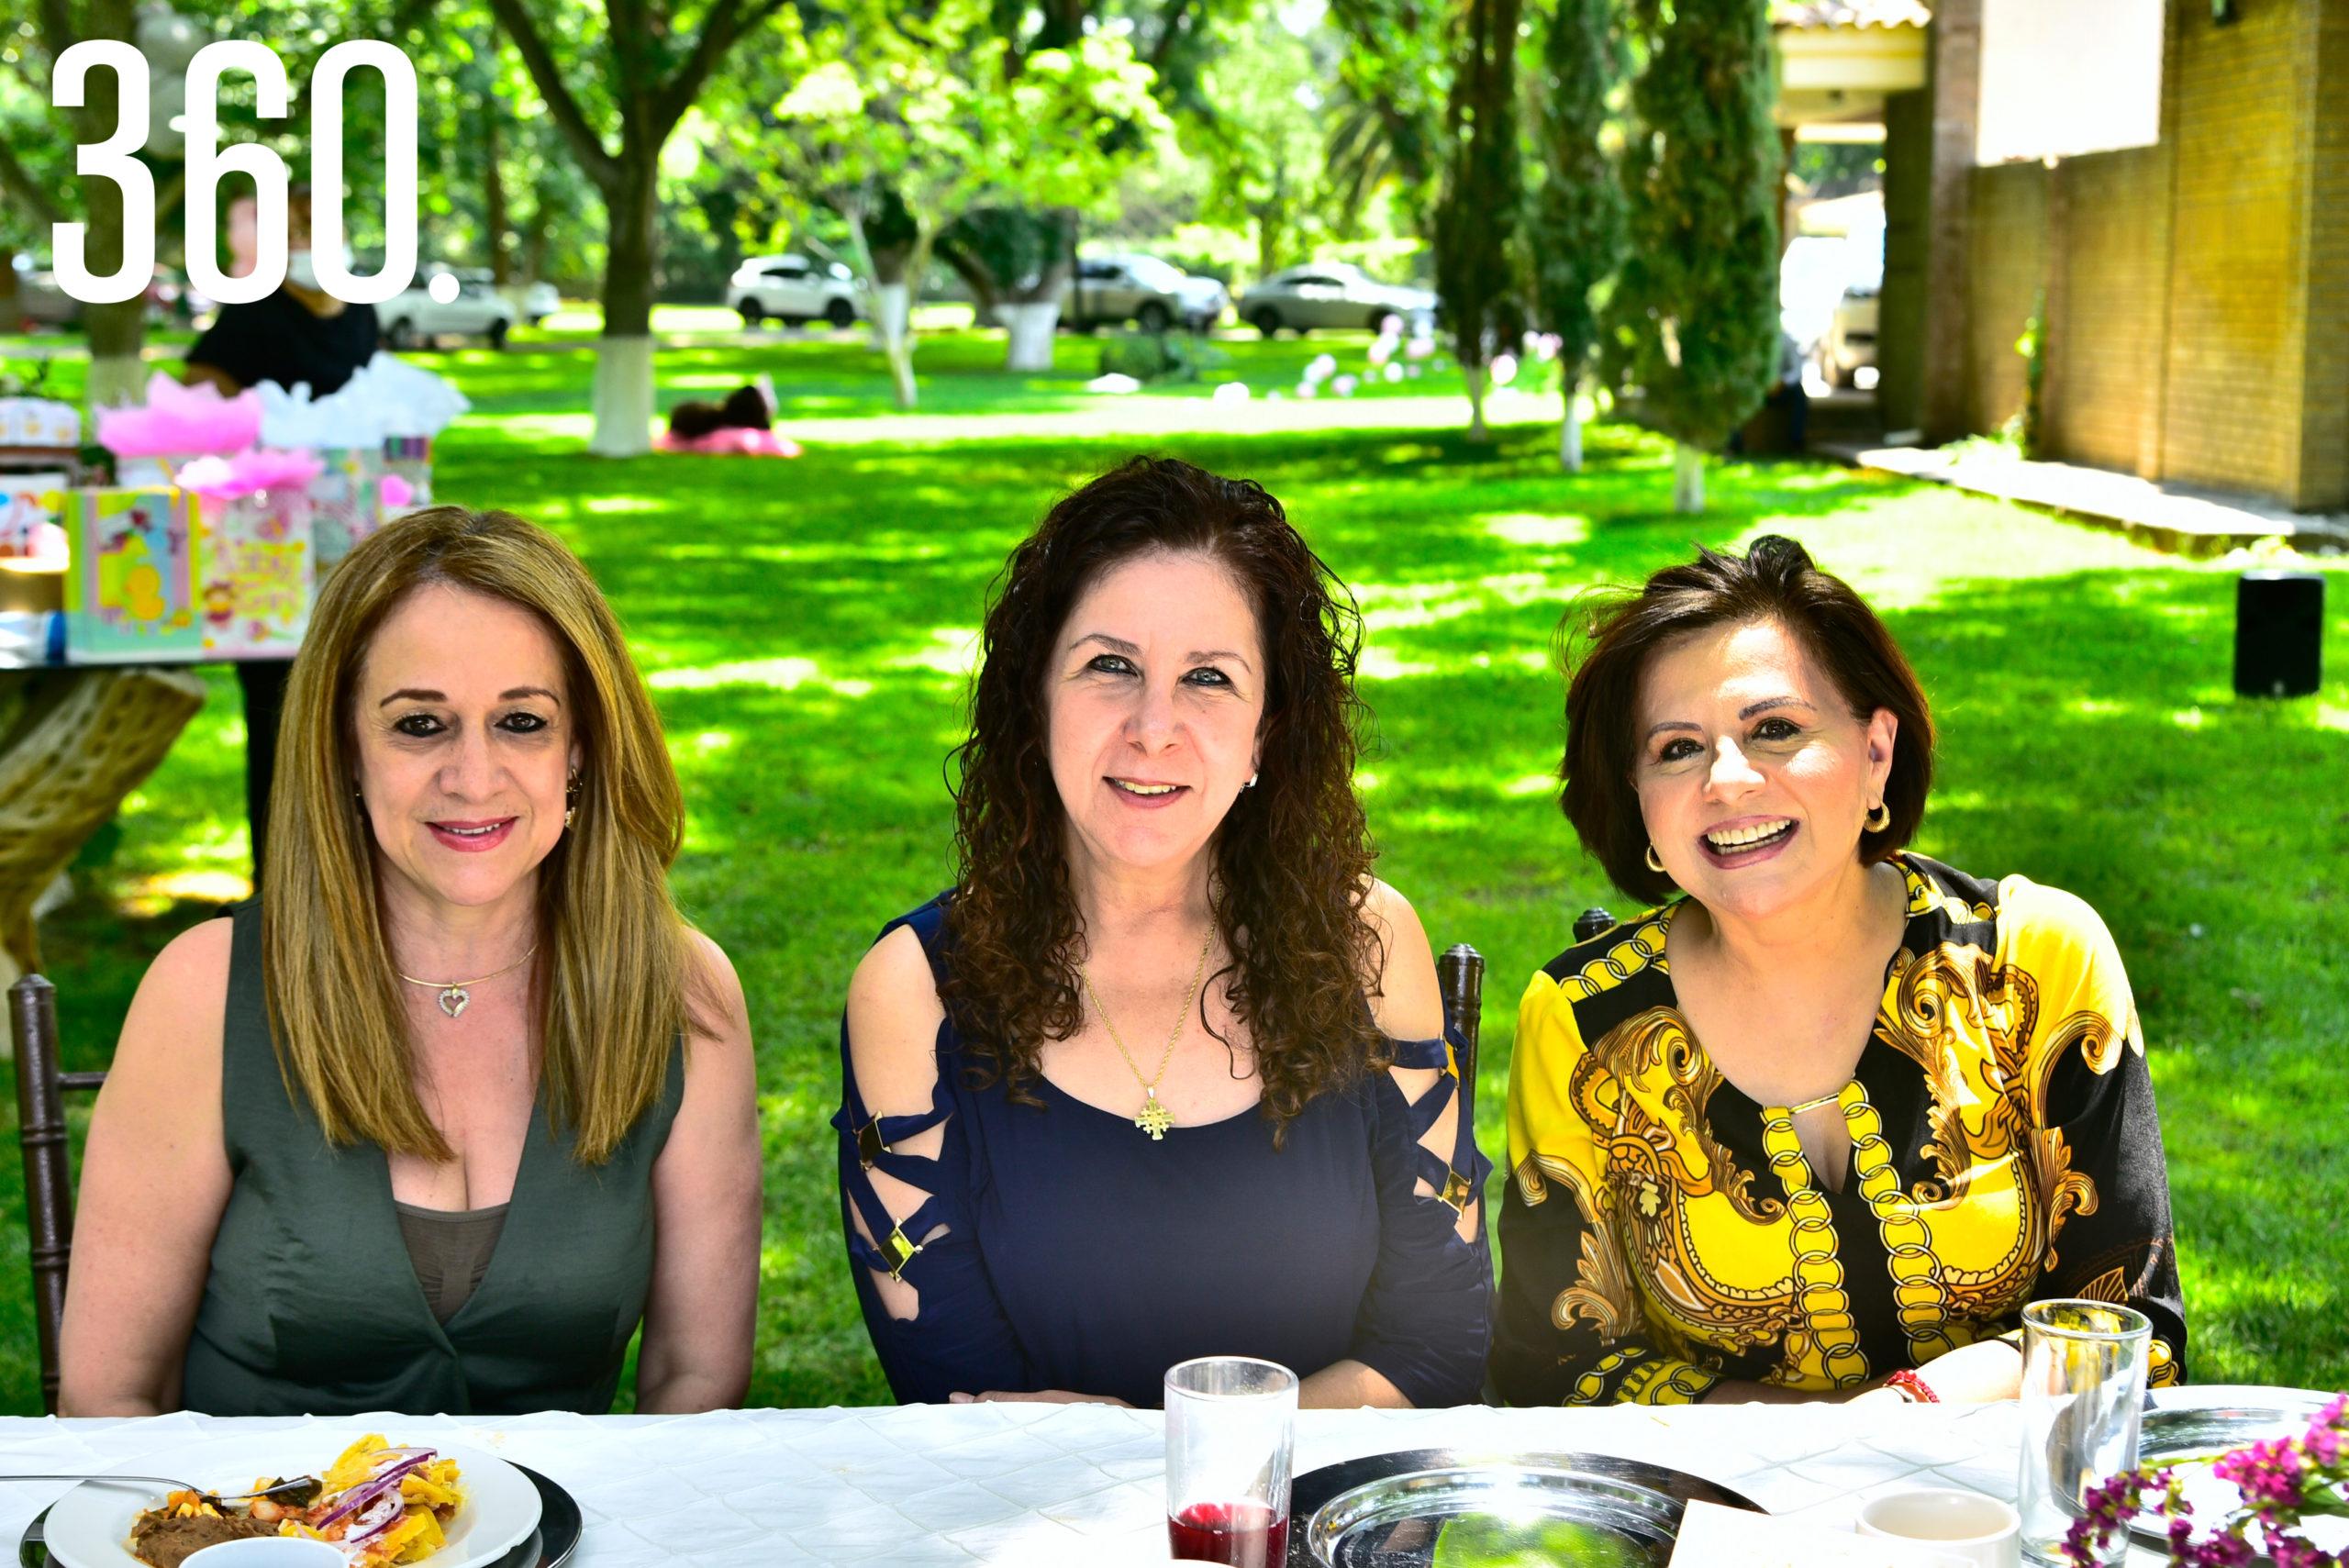 Inés Garza, Olga Hernández y Olga Durón.